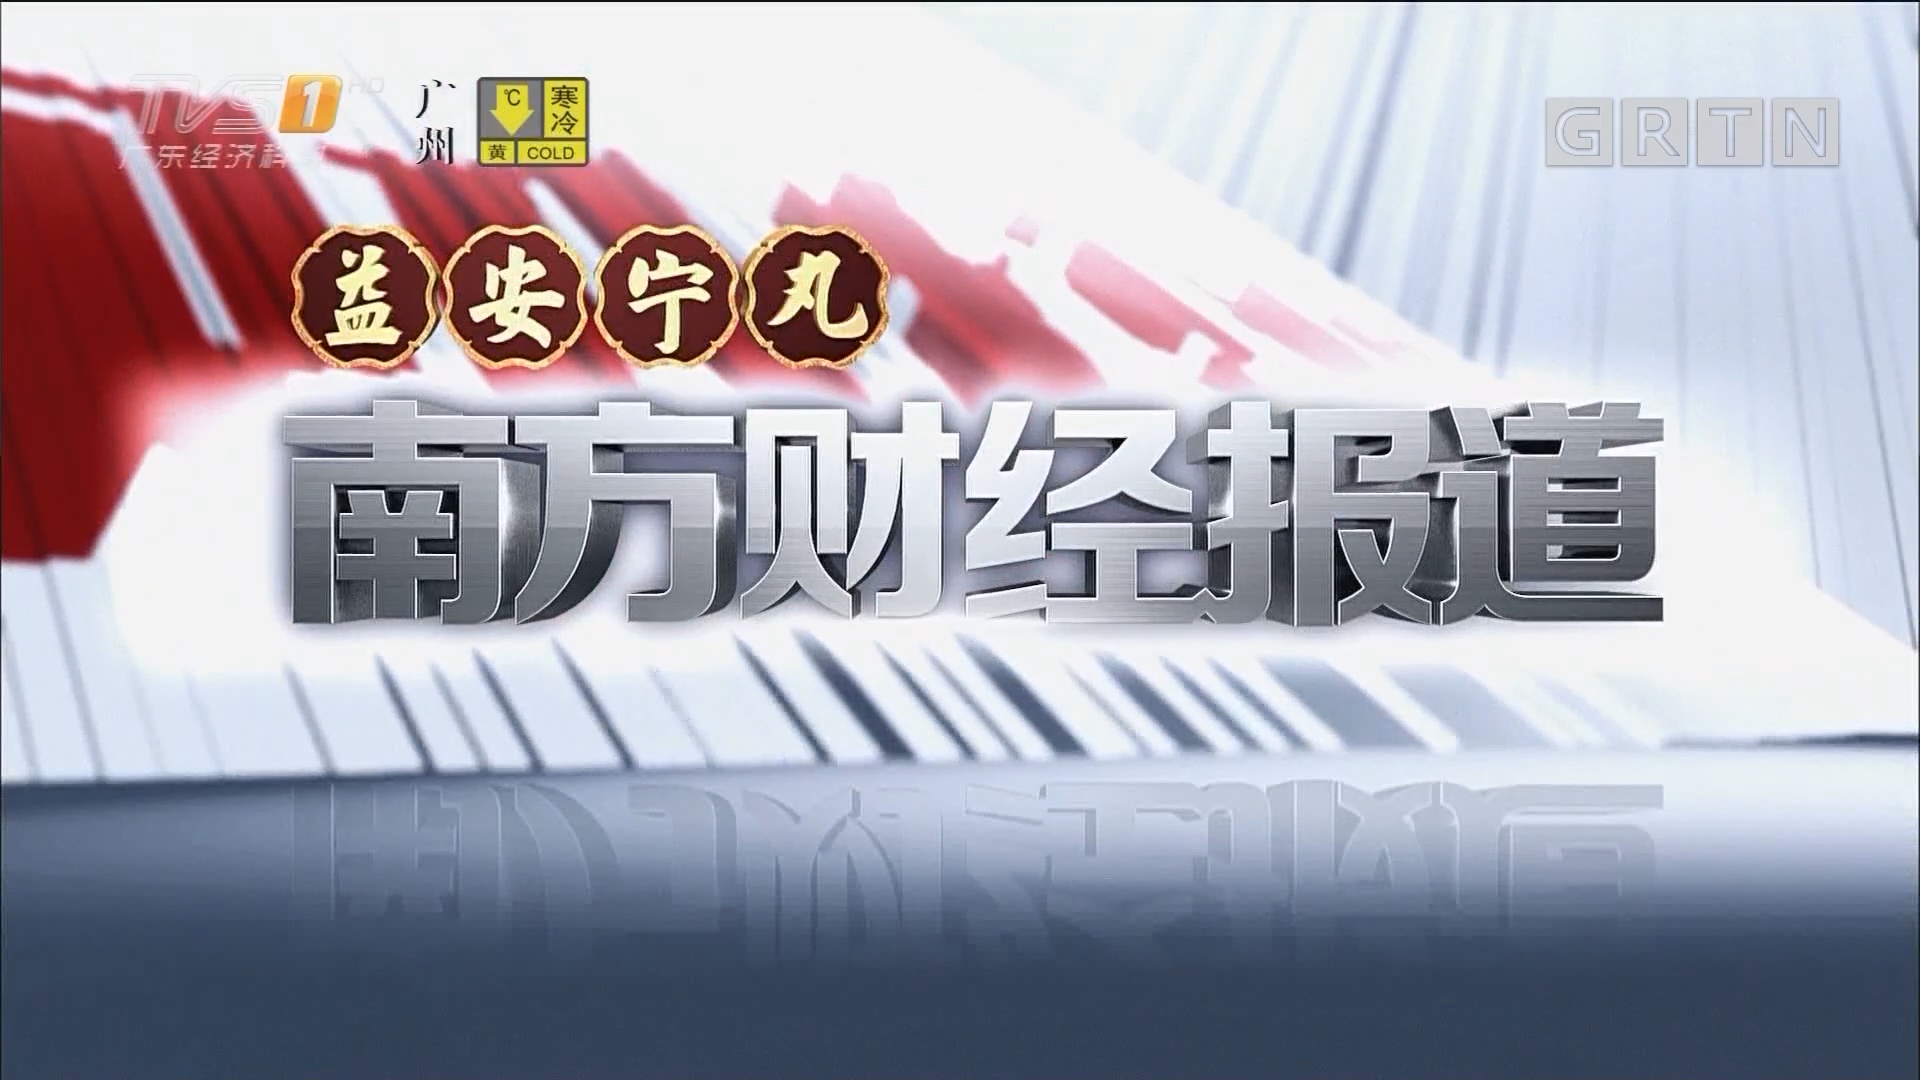 [HD][2018-12-07]南方财经报道:广州:全球市长论坛开幕 生态环境治理成焦点